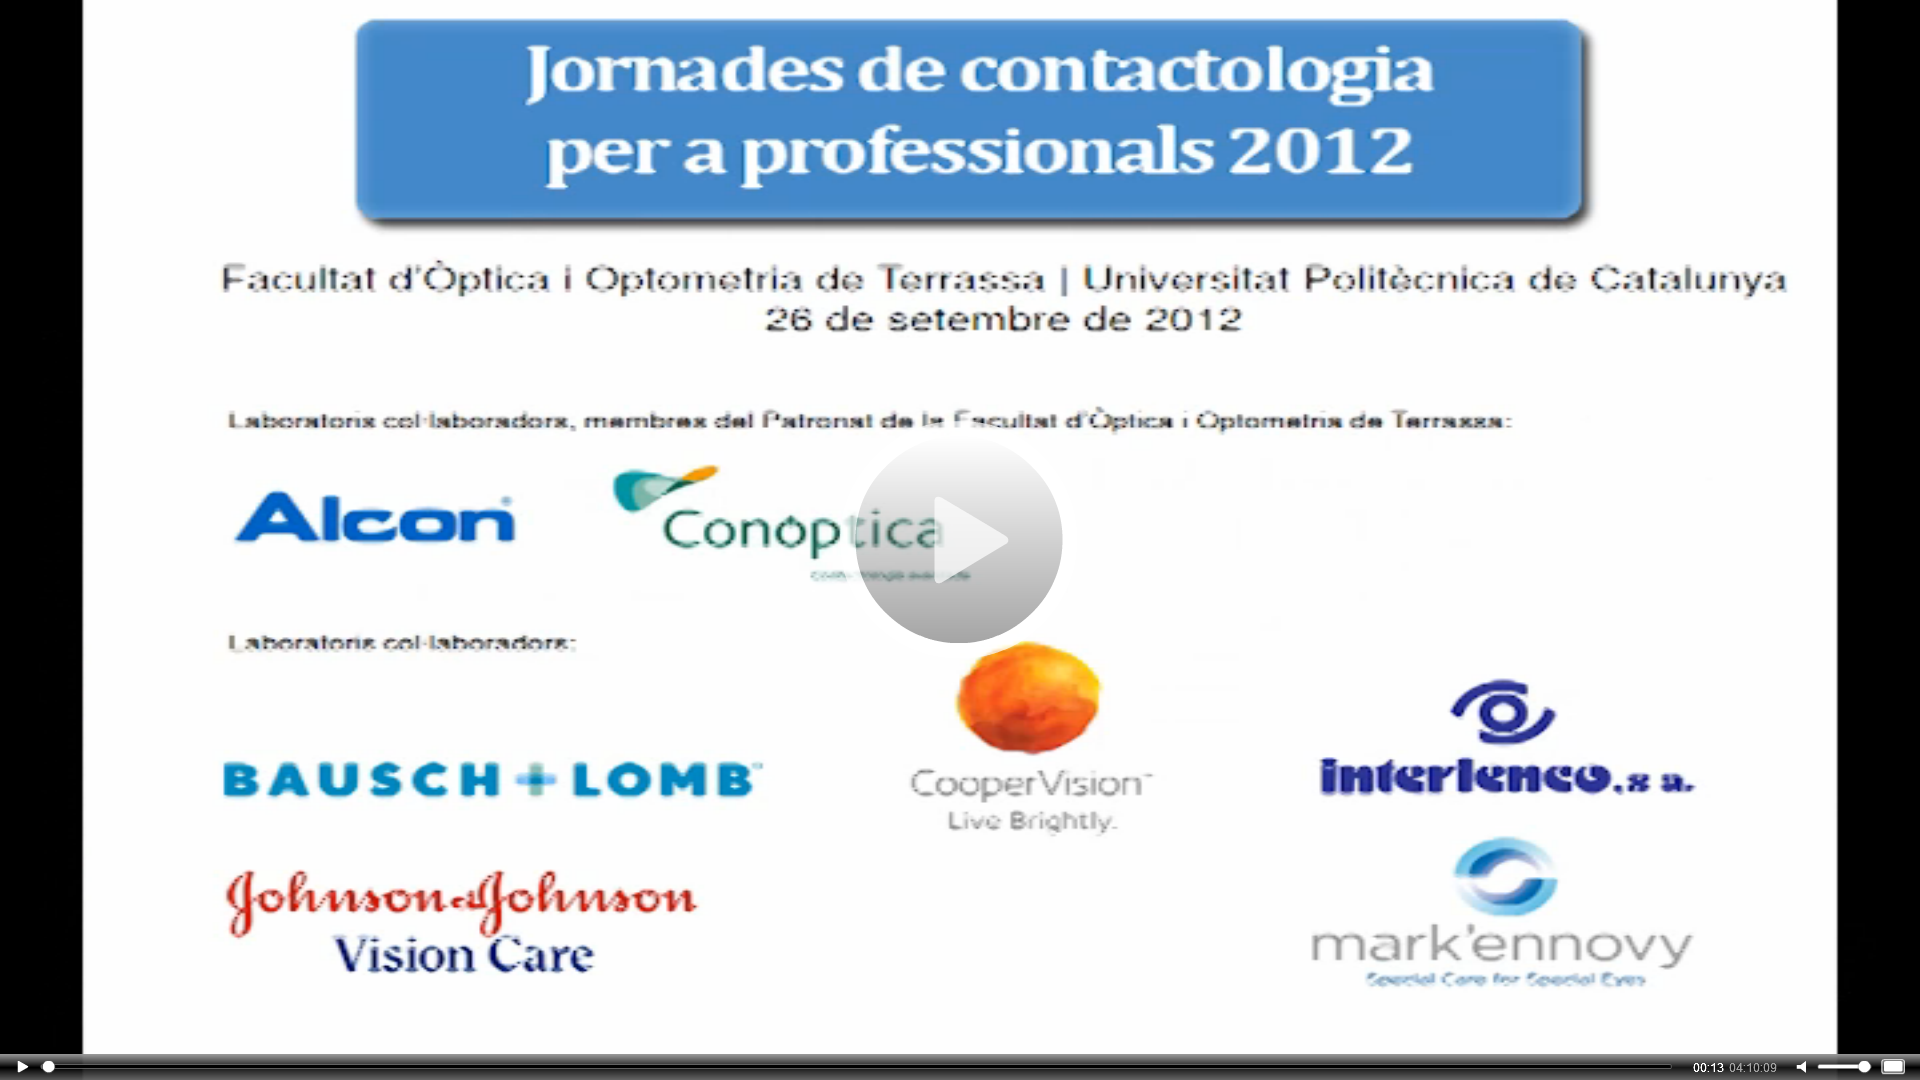 JLC2012_sesion_completa